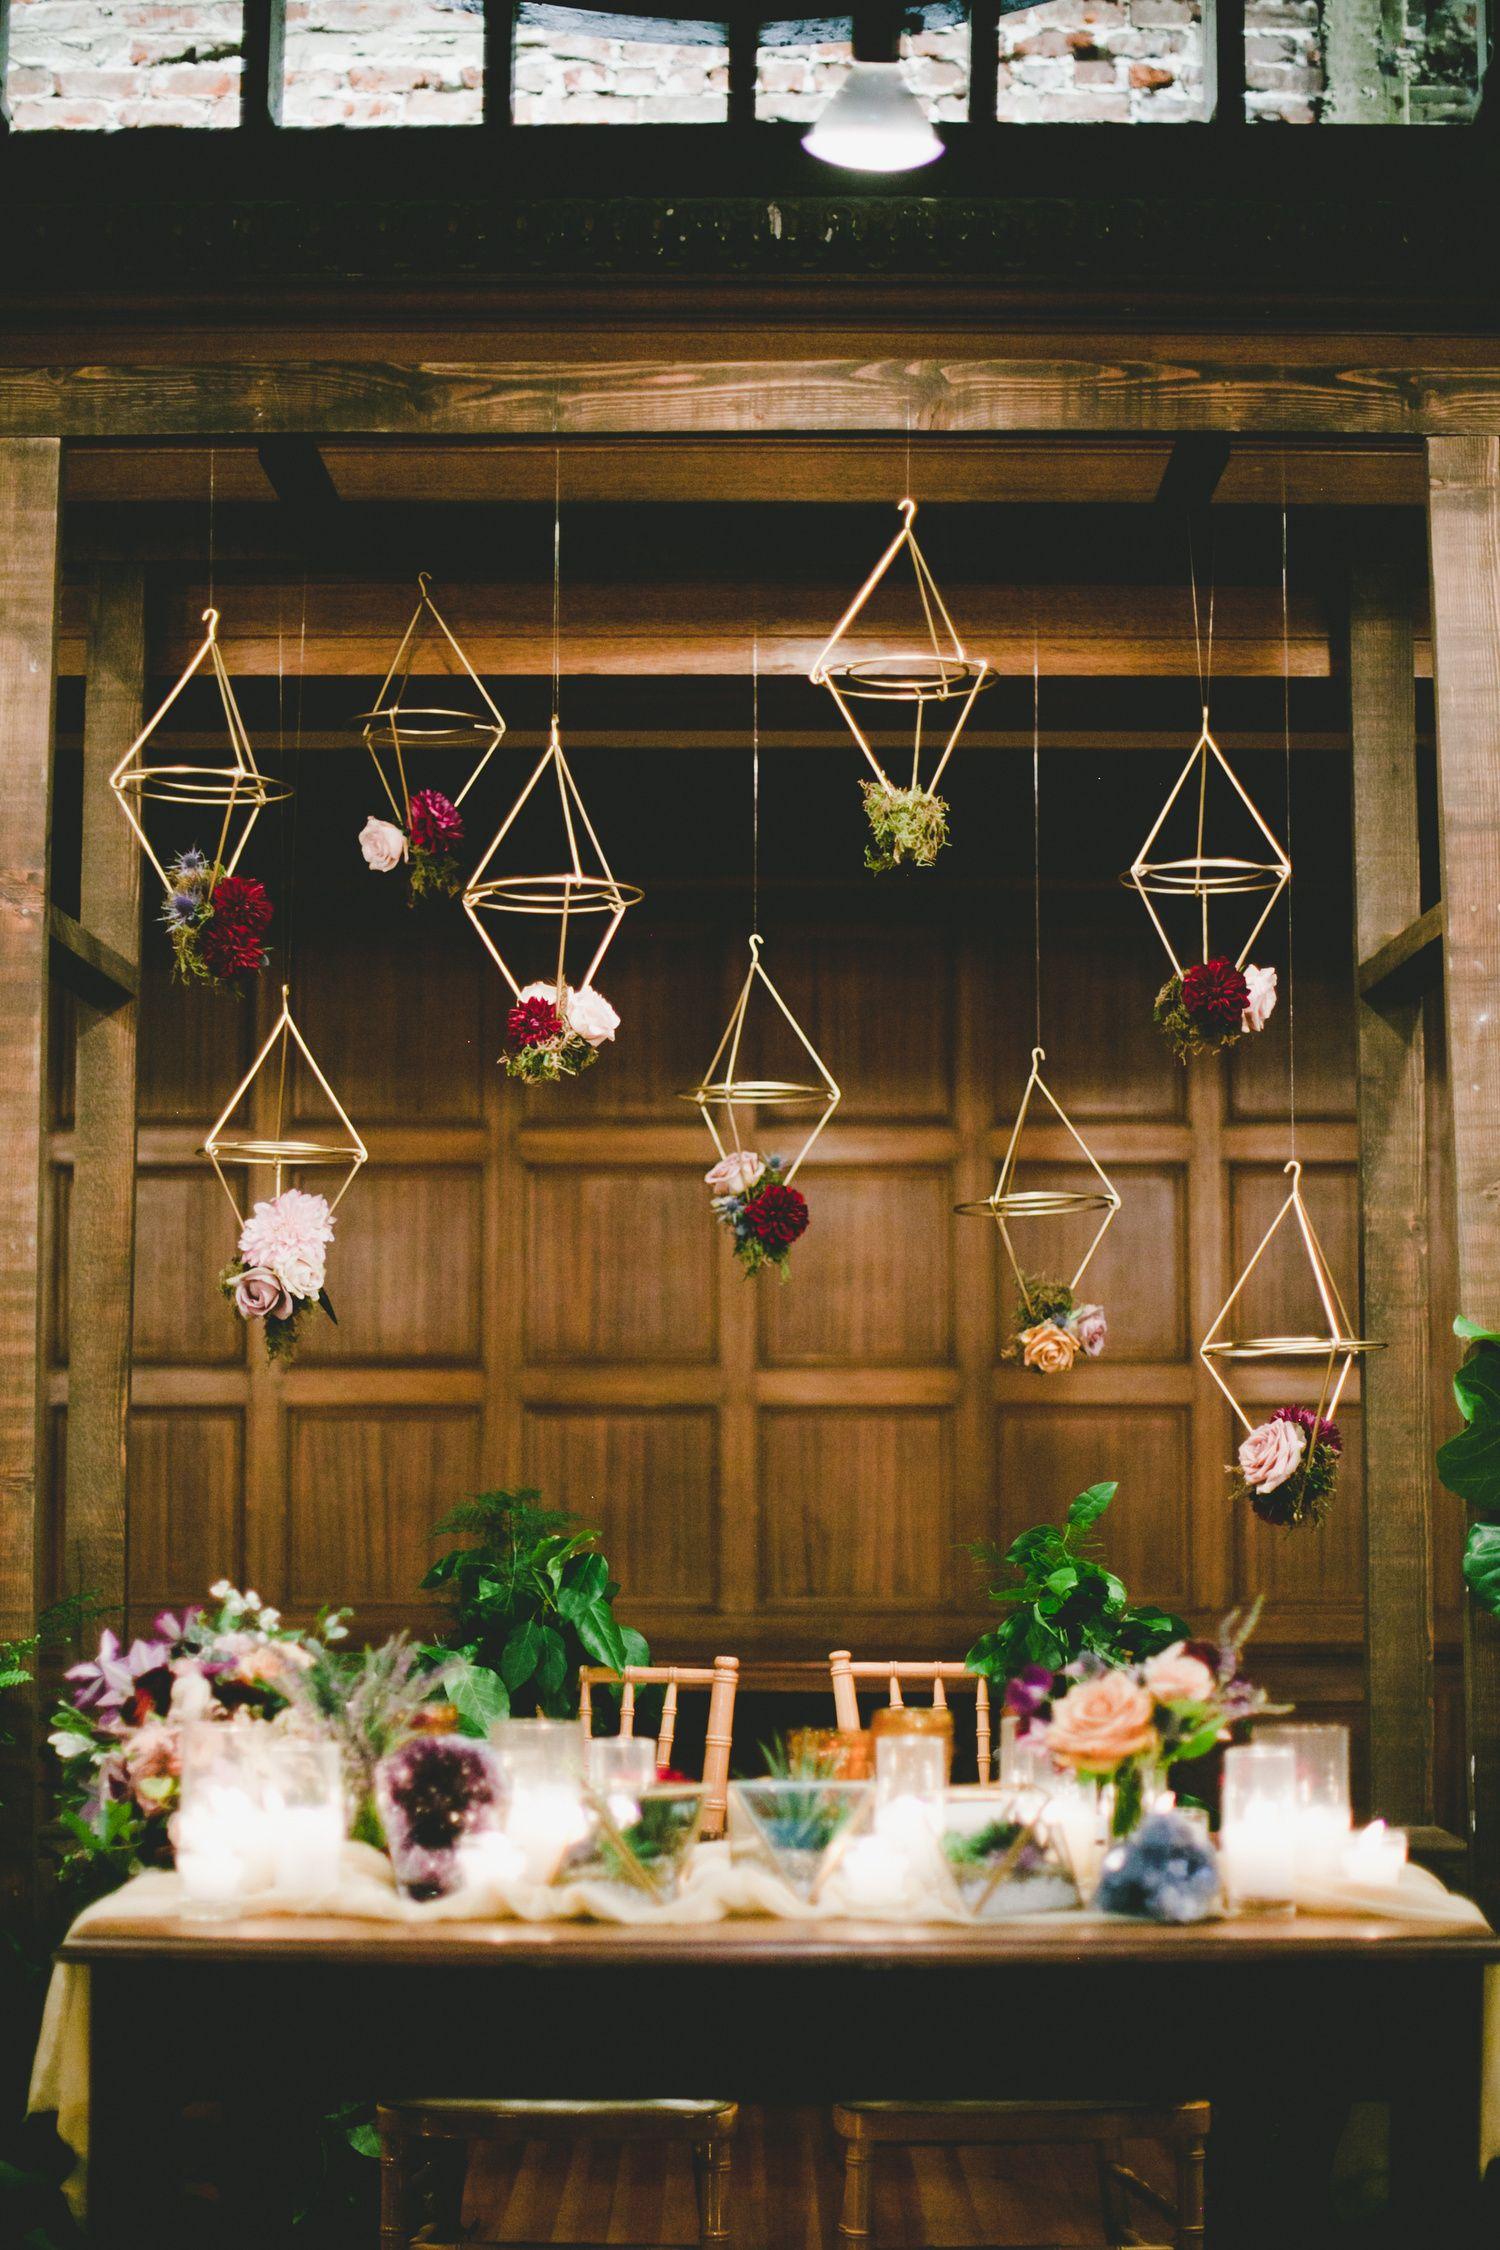 Read More Https Www Stylemepretty Com 2015 11 03 Mod Geometric Rustic Wedding At The Loft On Pine Geometric Wedding Decor Geometric Wedding Wedding Modern